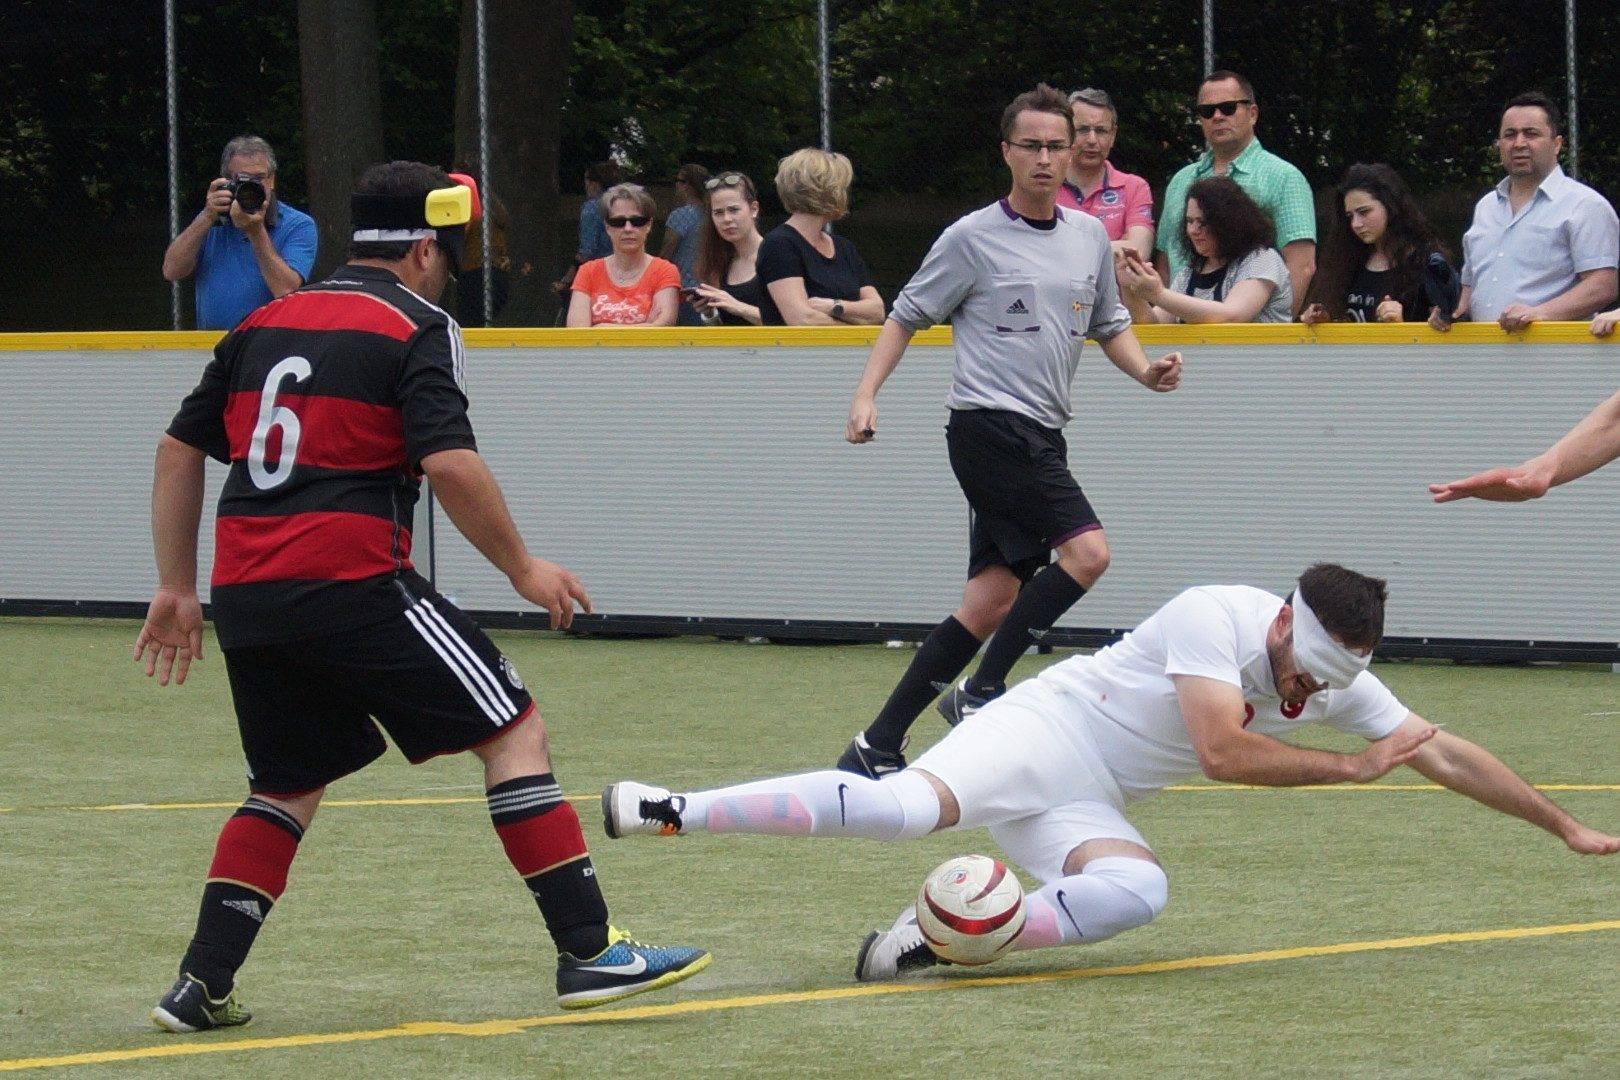 Türkischer Spieler kommt zu Fall, während er versucht den Ball zu schießen.